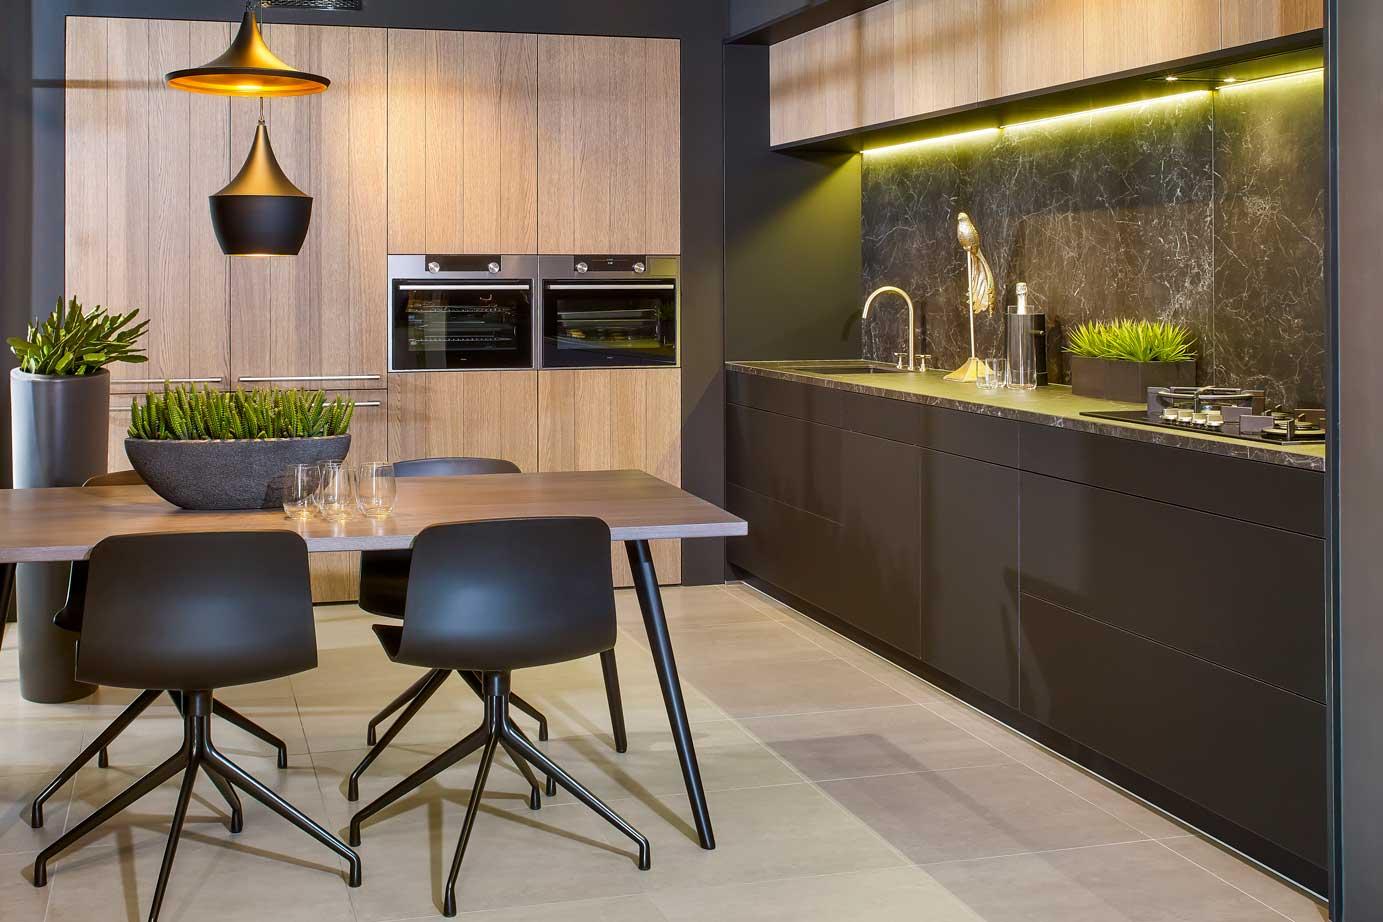 Luxe Design Keuken : Moderne keukens incl foto s en prijzen db keukens